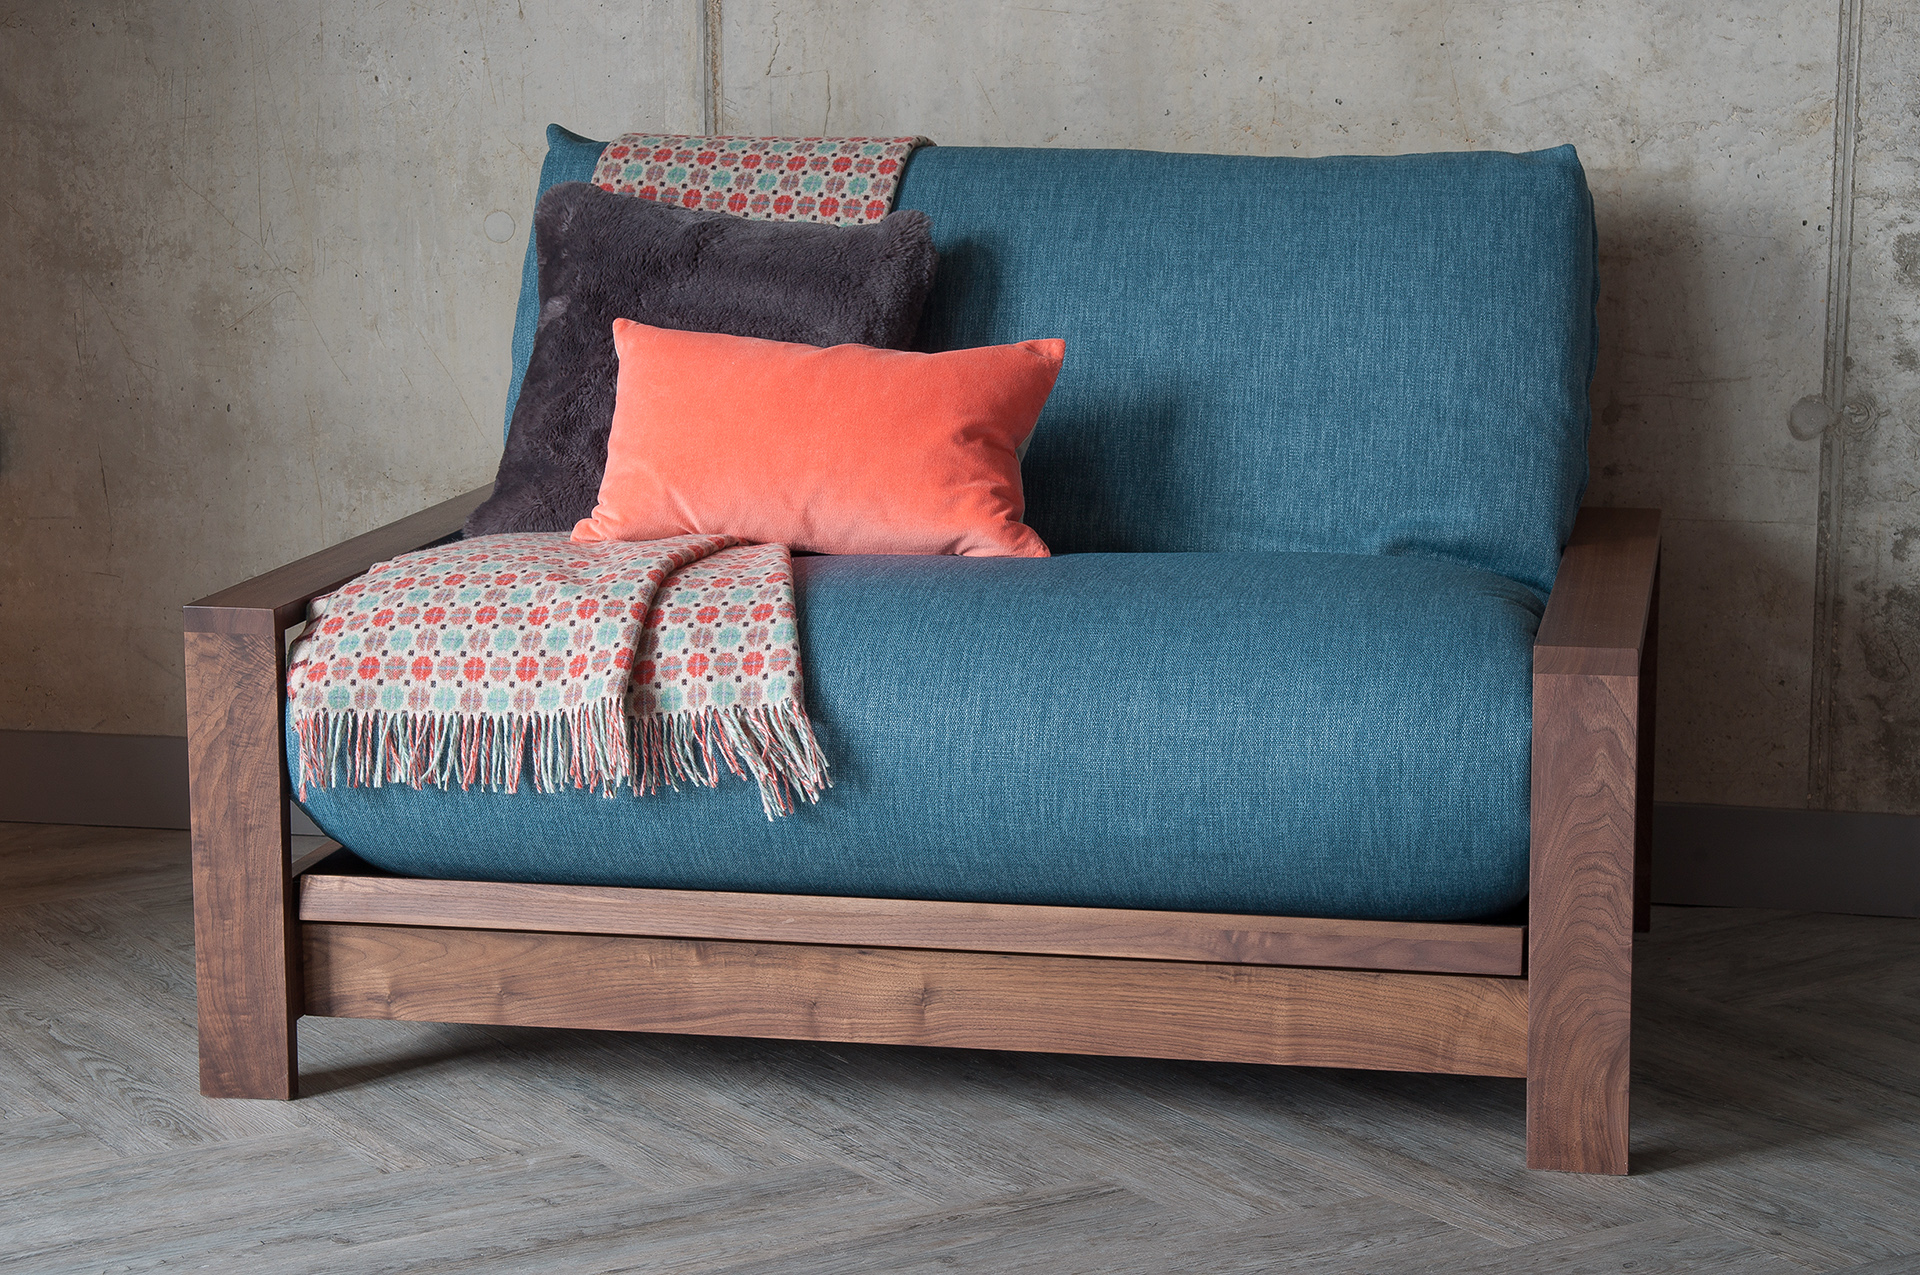 Black Lotus Walnut Panama sofa bed showing futon mattress in a loose cover